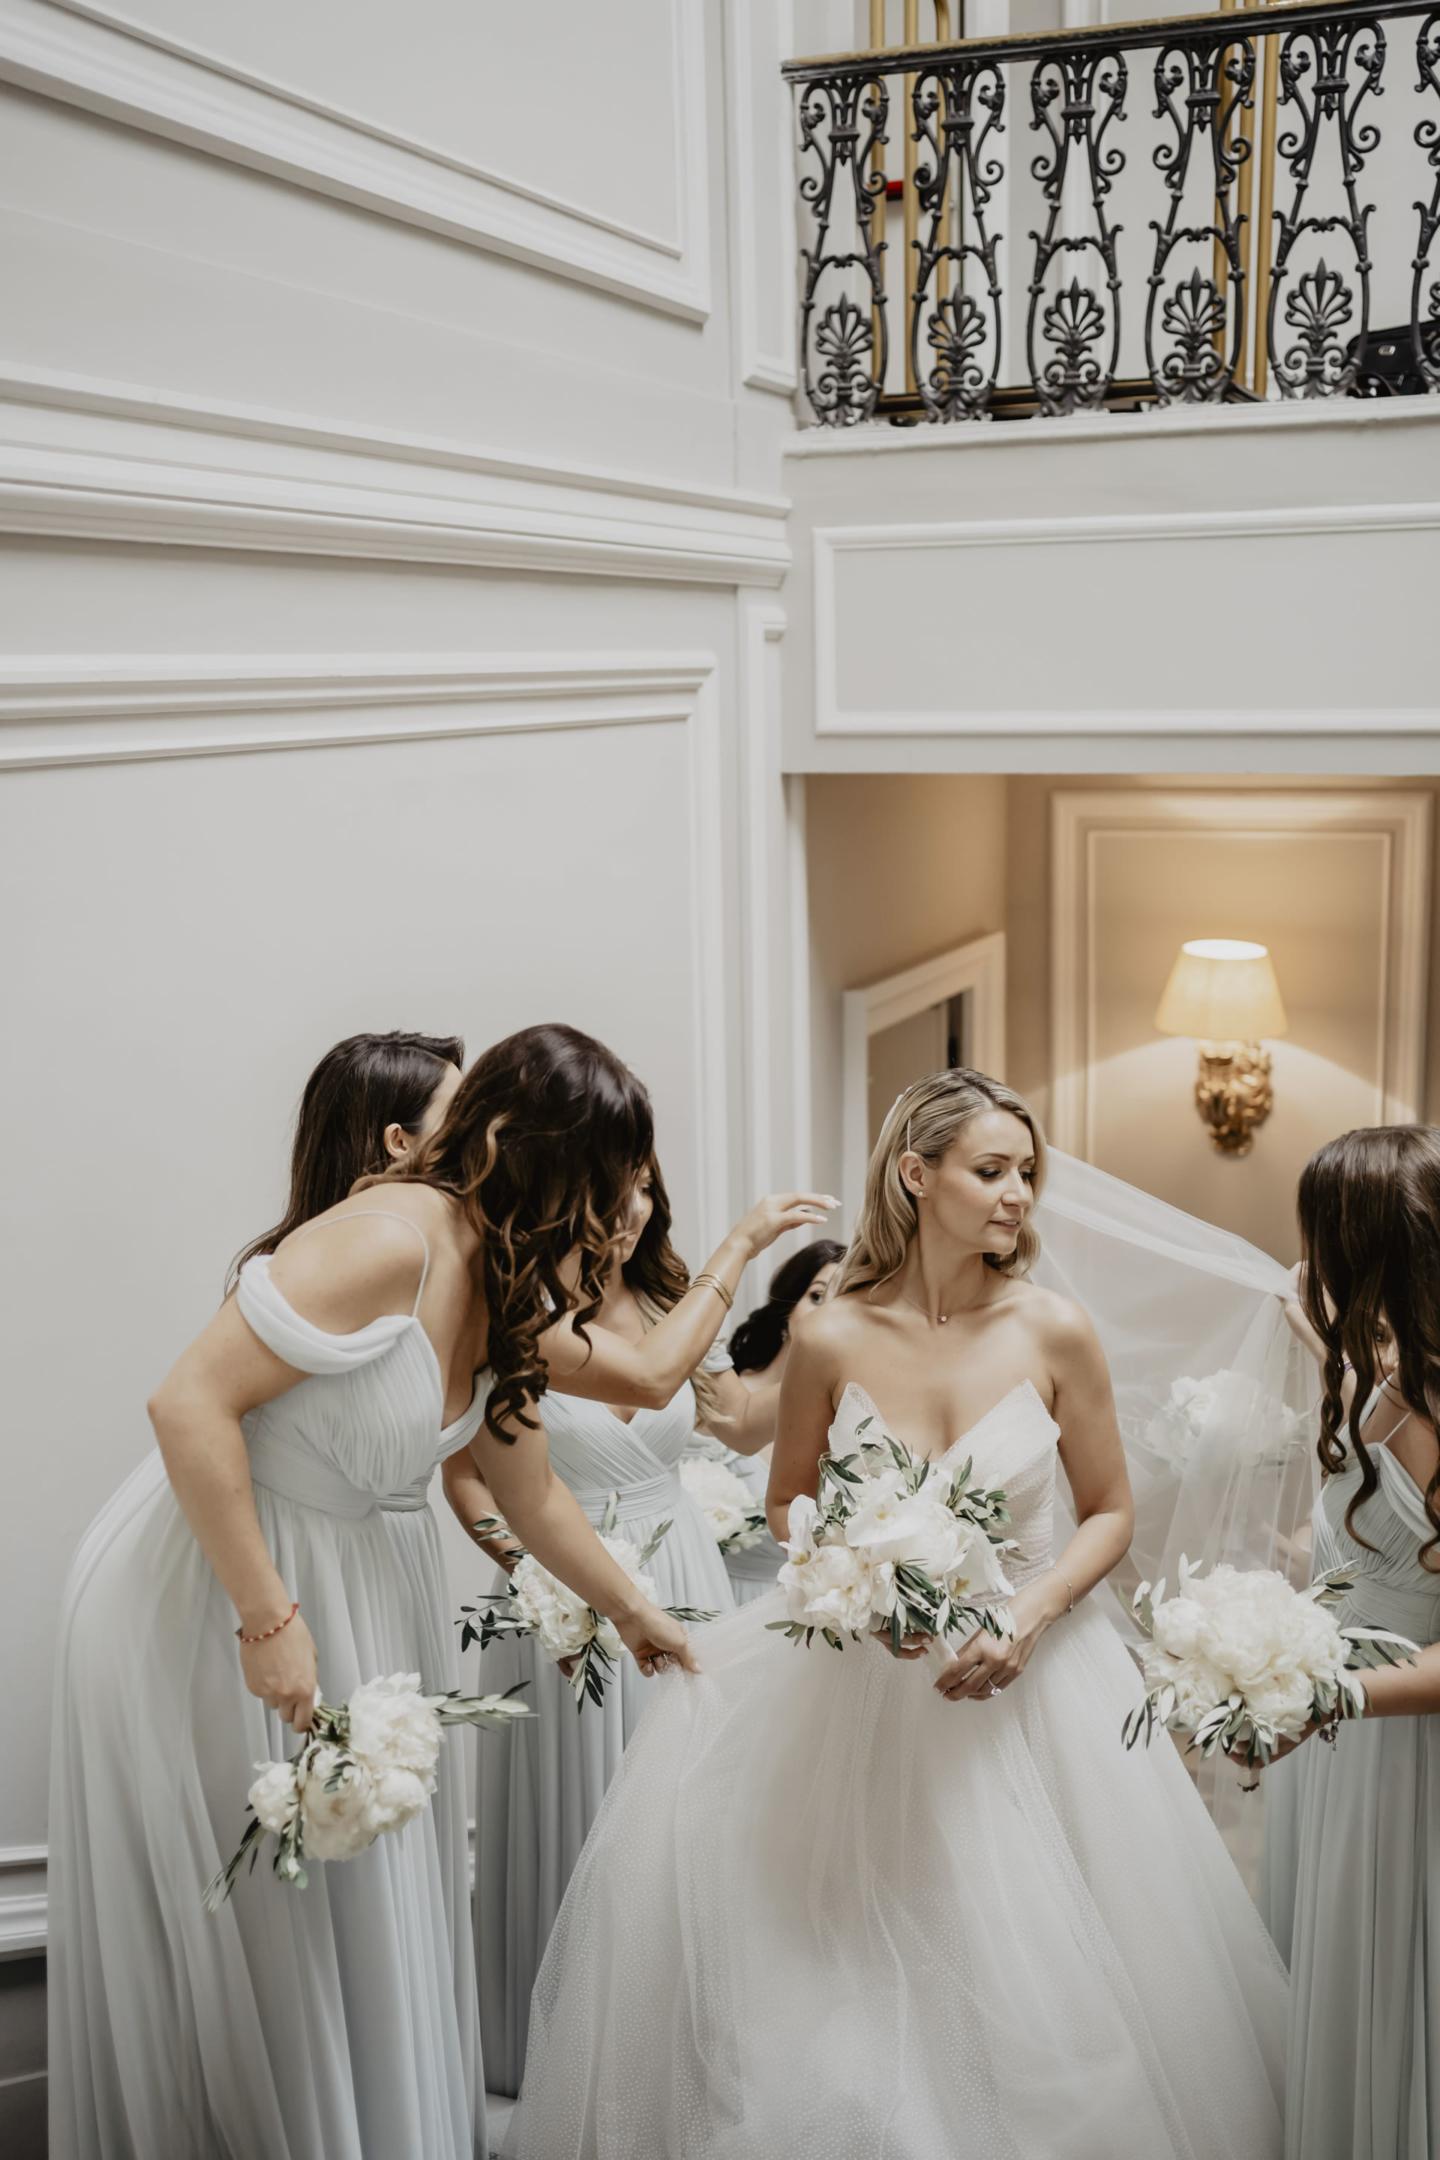 A sparkling wedding in the shore of the Arno - 22 :: A sparkling wedding on the shore of the Arno :: Luxury wedding photography - 21 :: A sparkling wedding in the shore of the Arno - 22